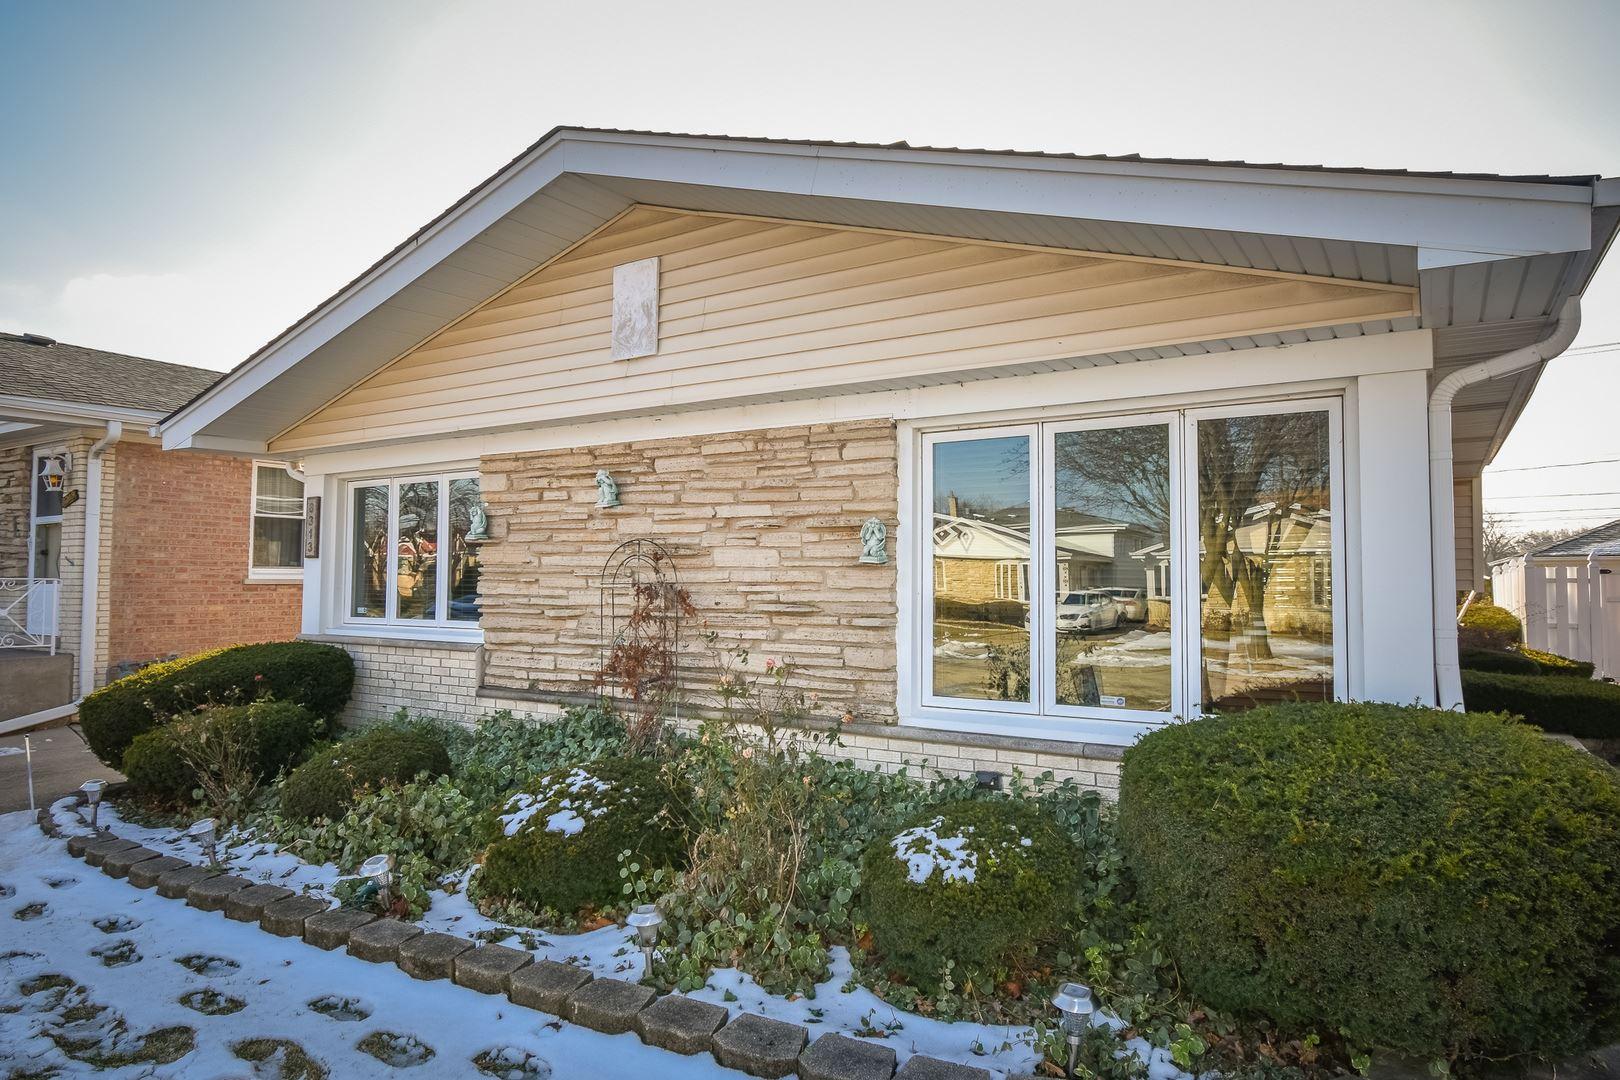 8313 W Maple Avenue, Norridge, IL 60706 - #: 10928882